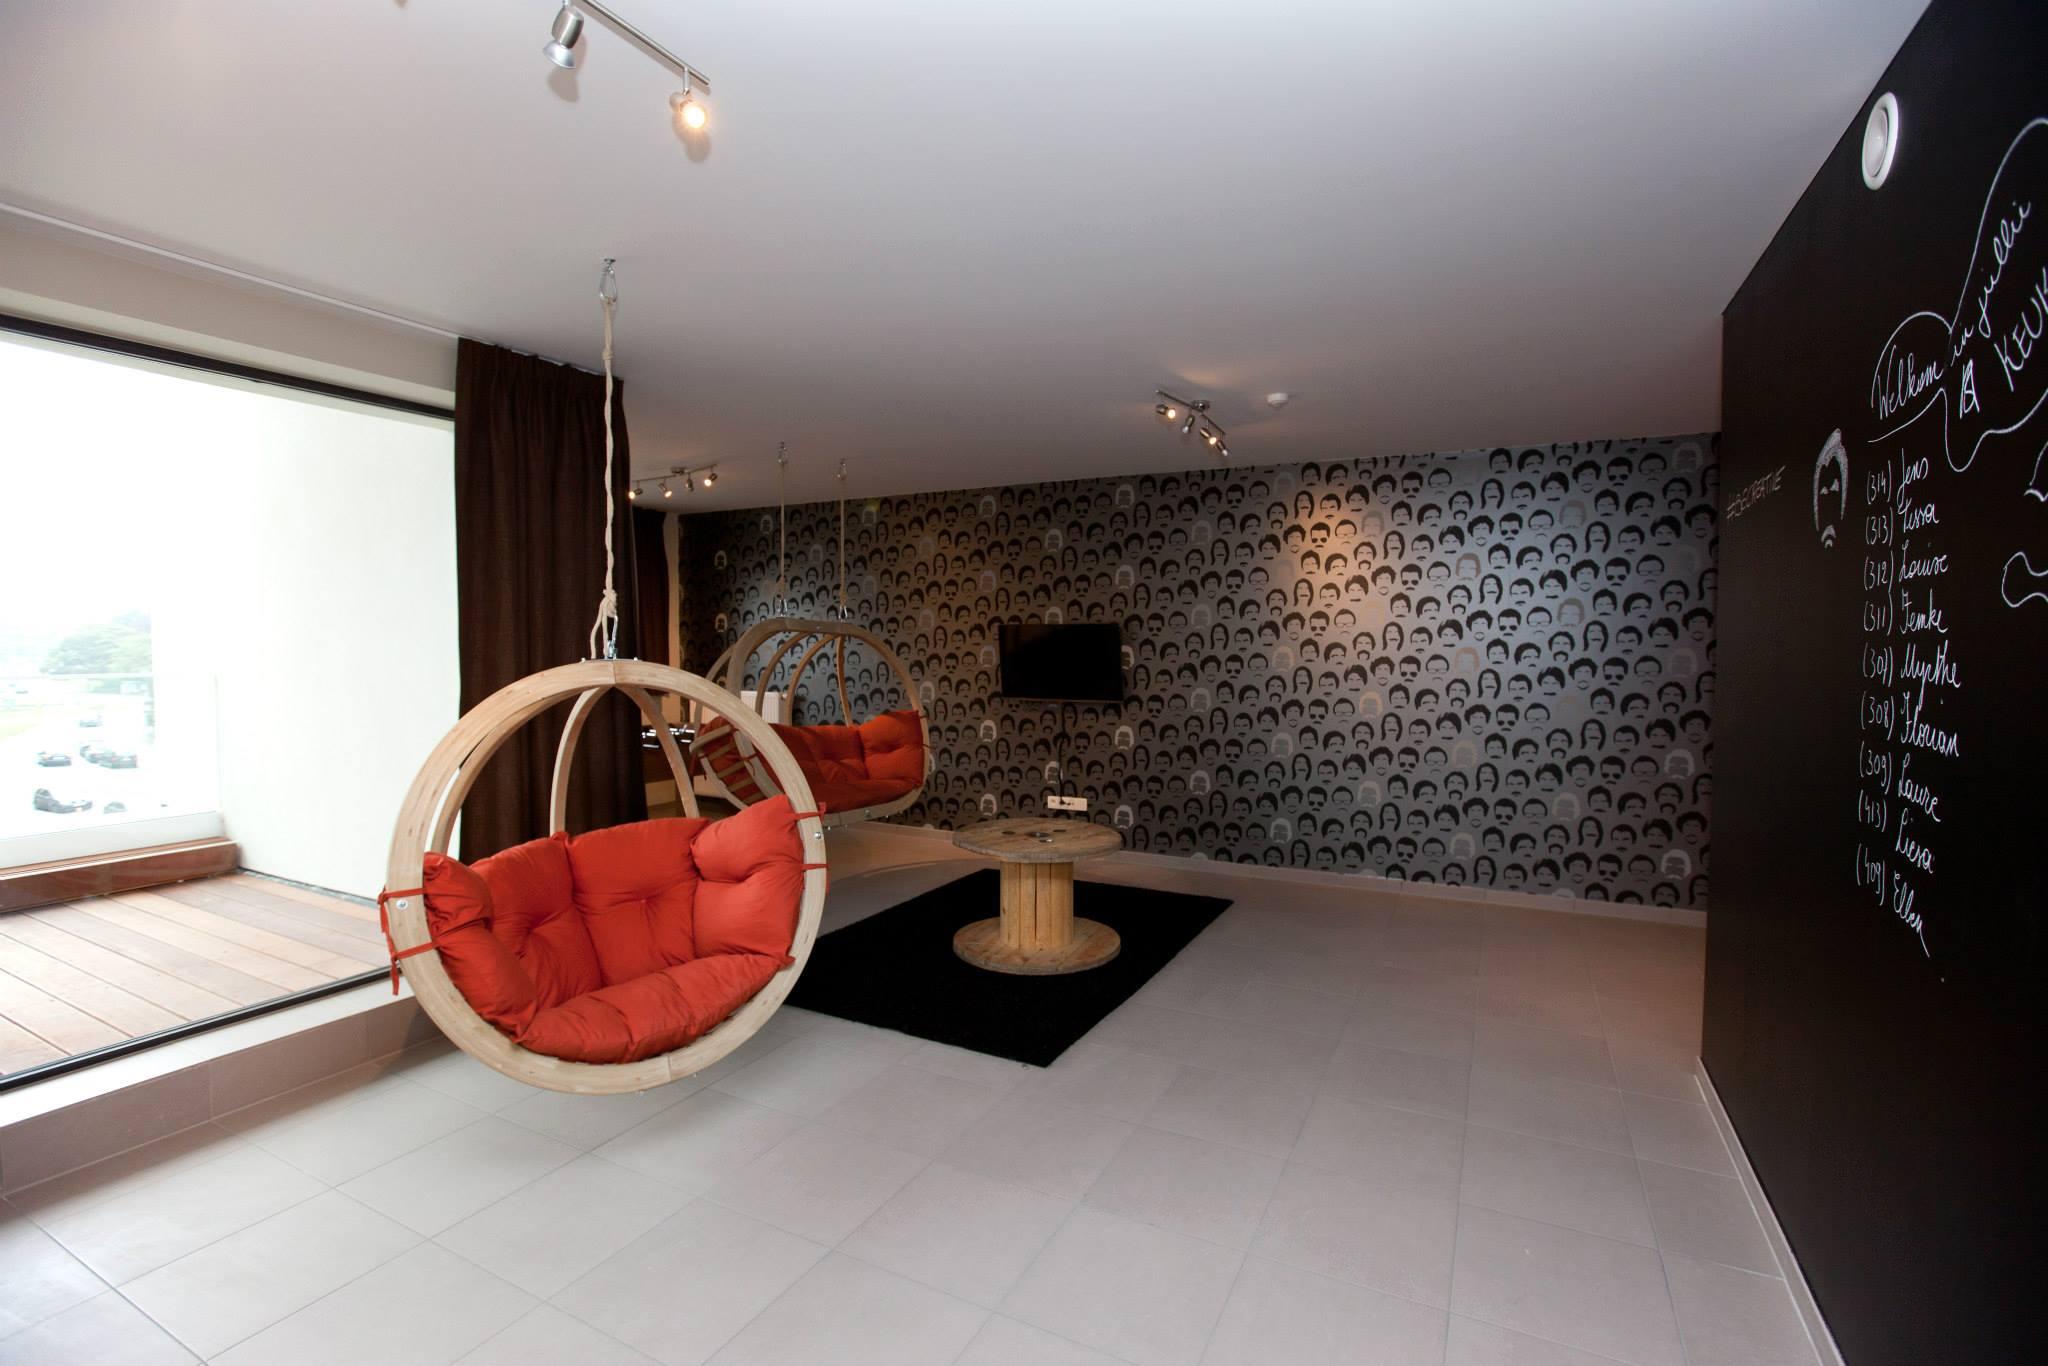 10631215 709638425780701 5378059254025419795 o 709638425780701 | Baeyens & Beck architecten Gent | architect nieuwbouw renovatie interieur | high end | architectenbureau